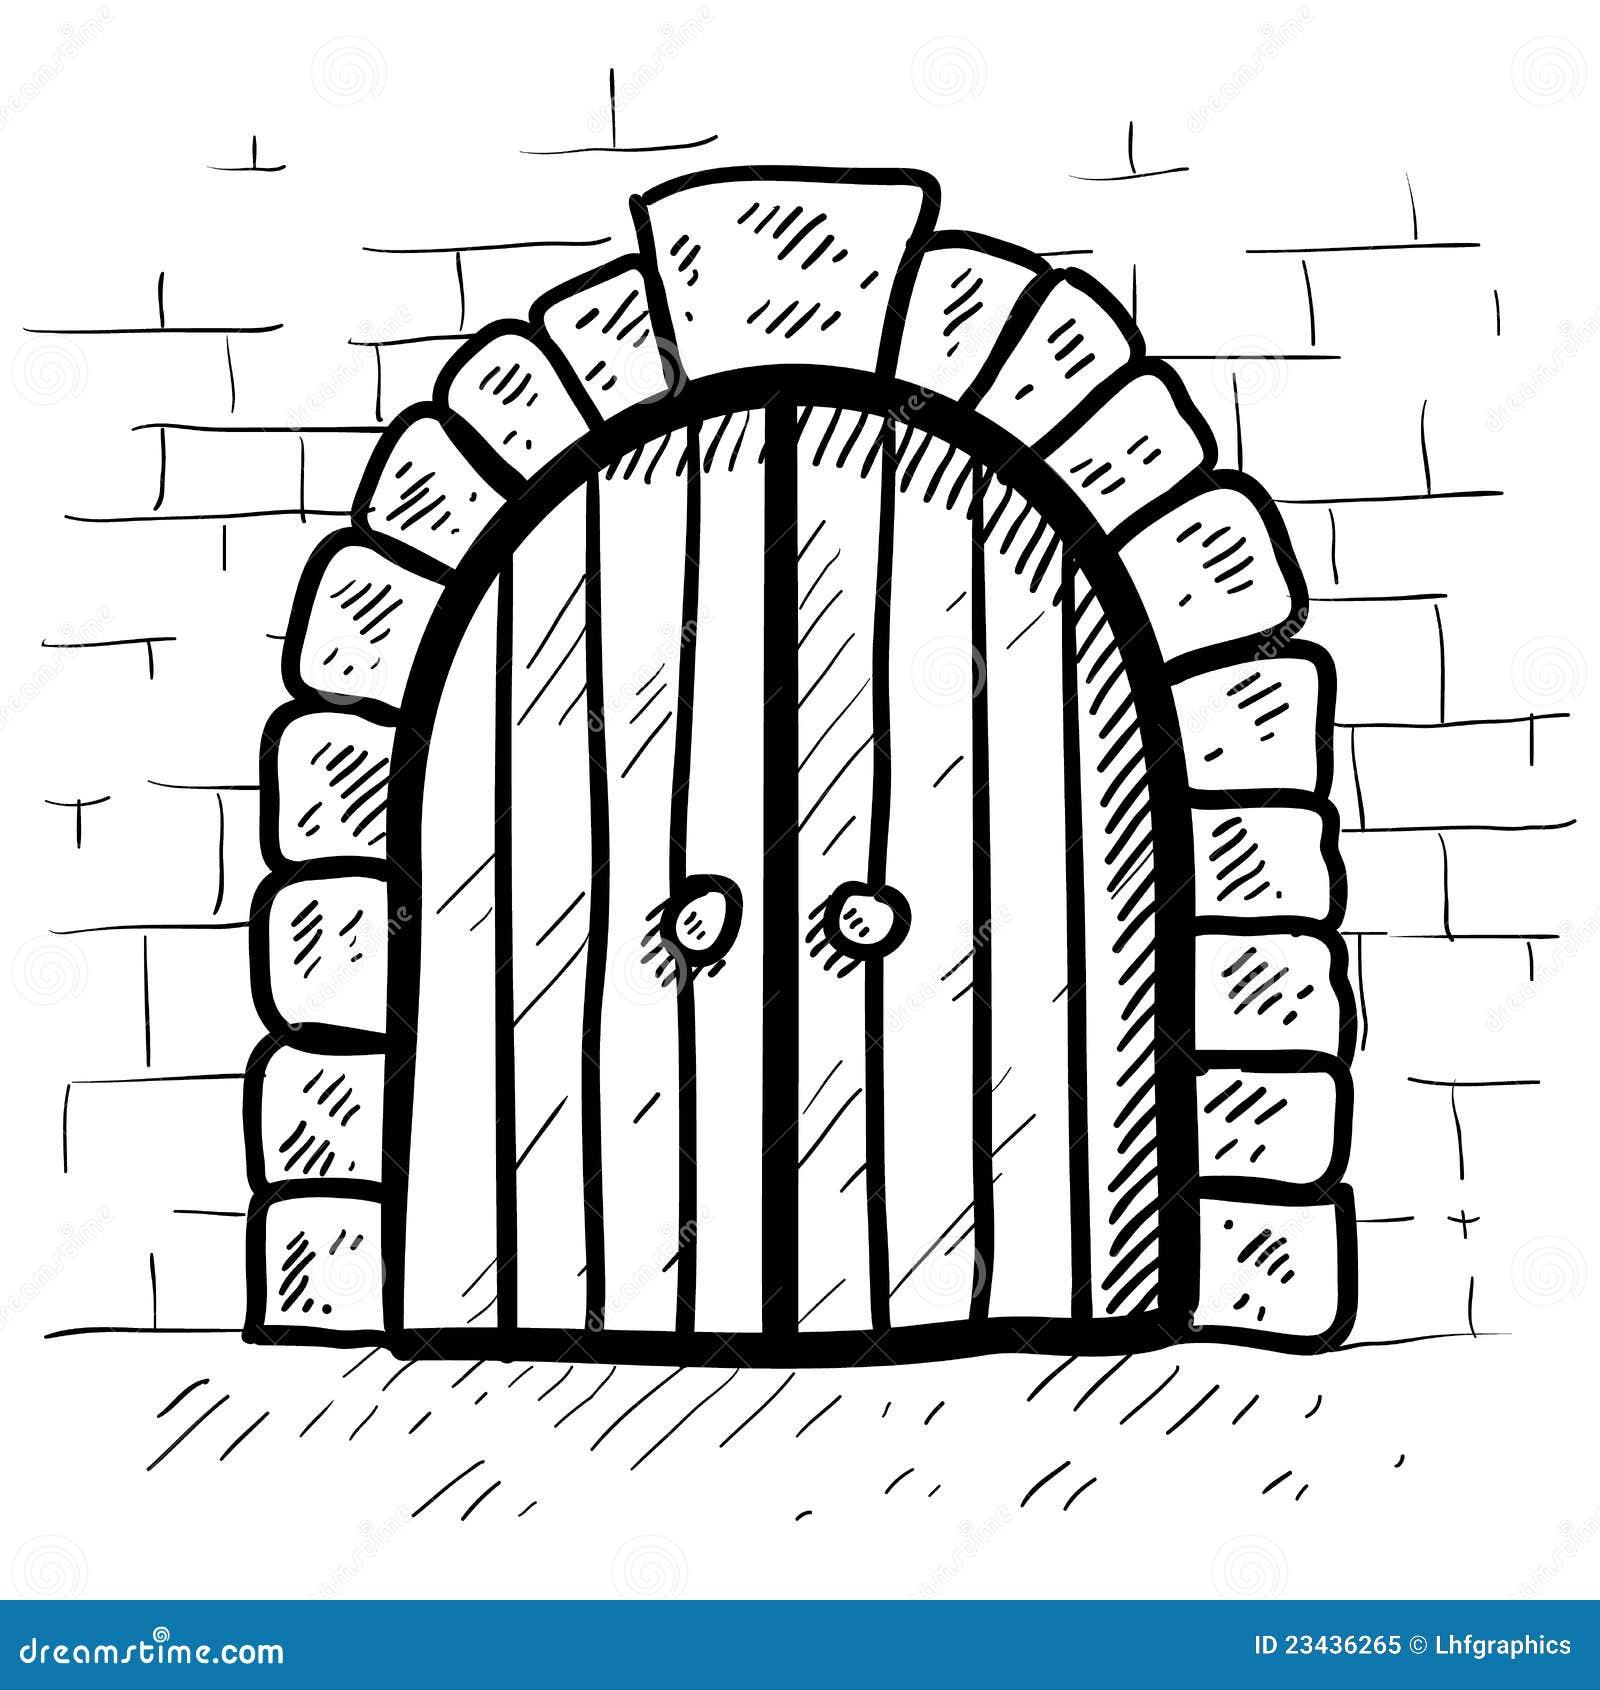 Secure Door Sketch Stock Vector Illustration Of Medieval